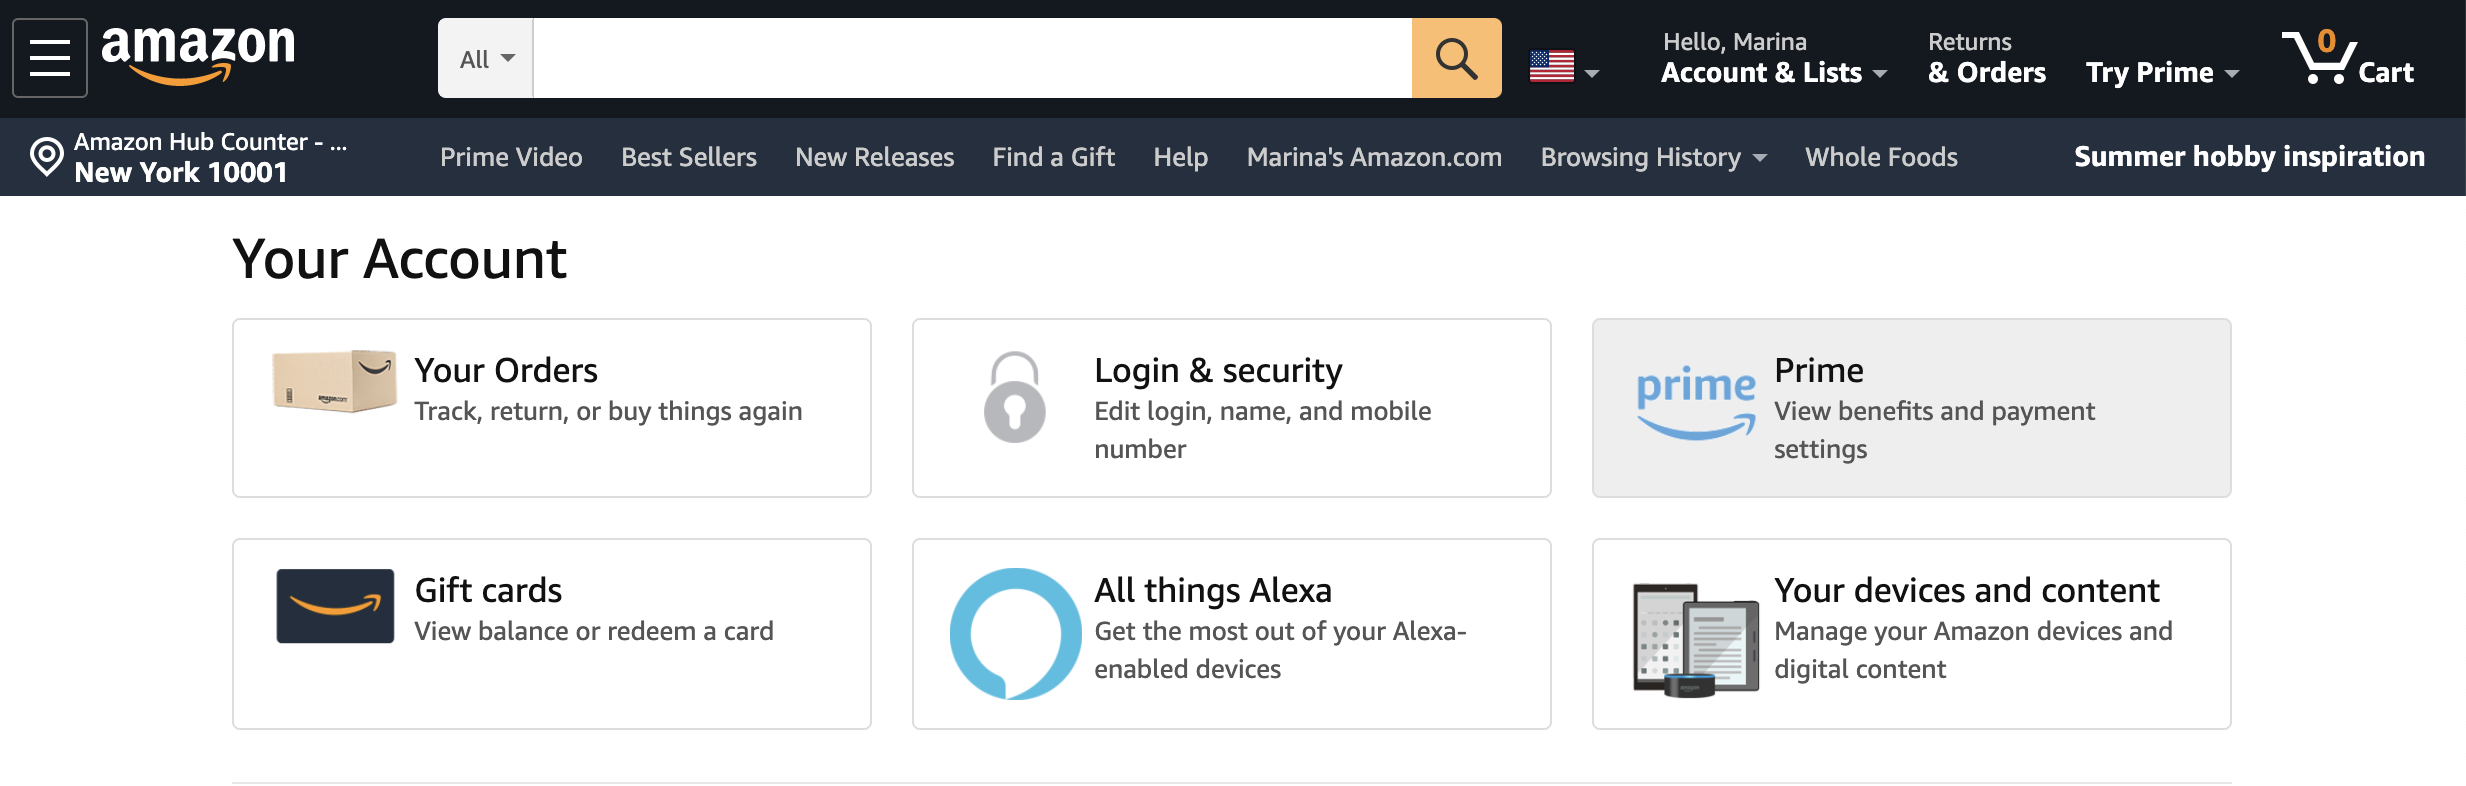 Delete Amazon Prime account